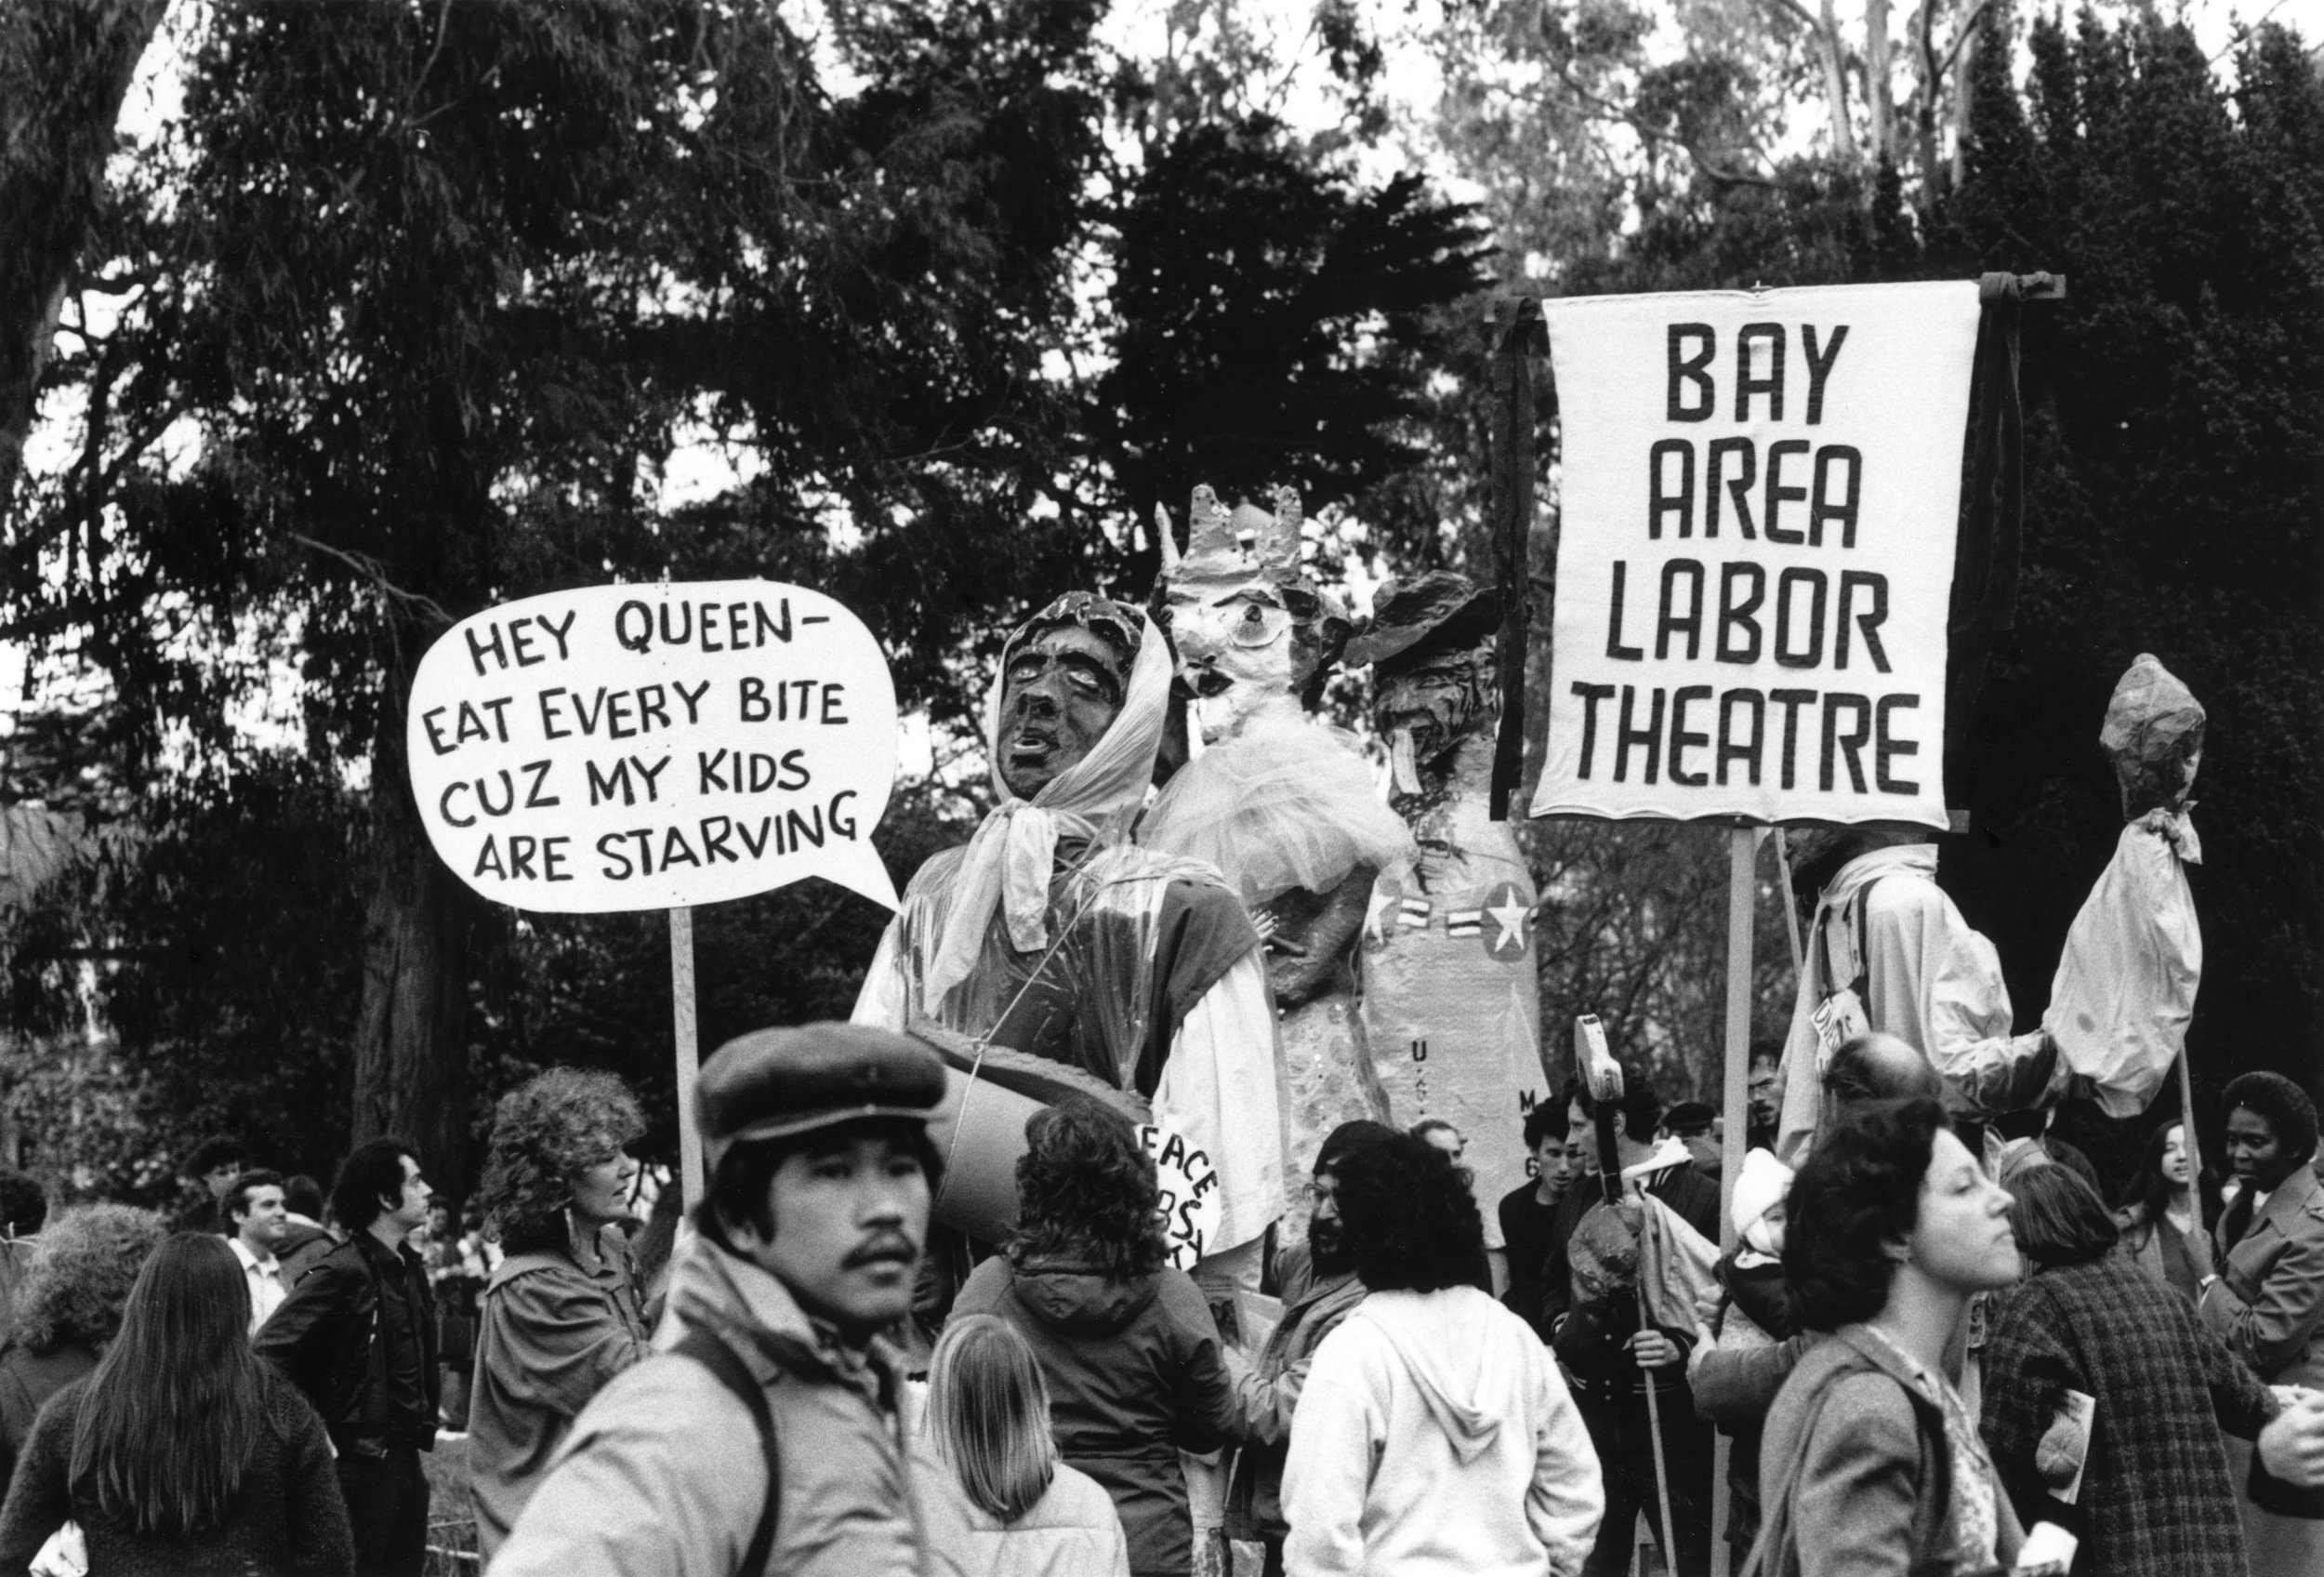 Protest in Golden Gate Park